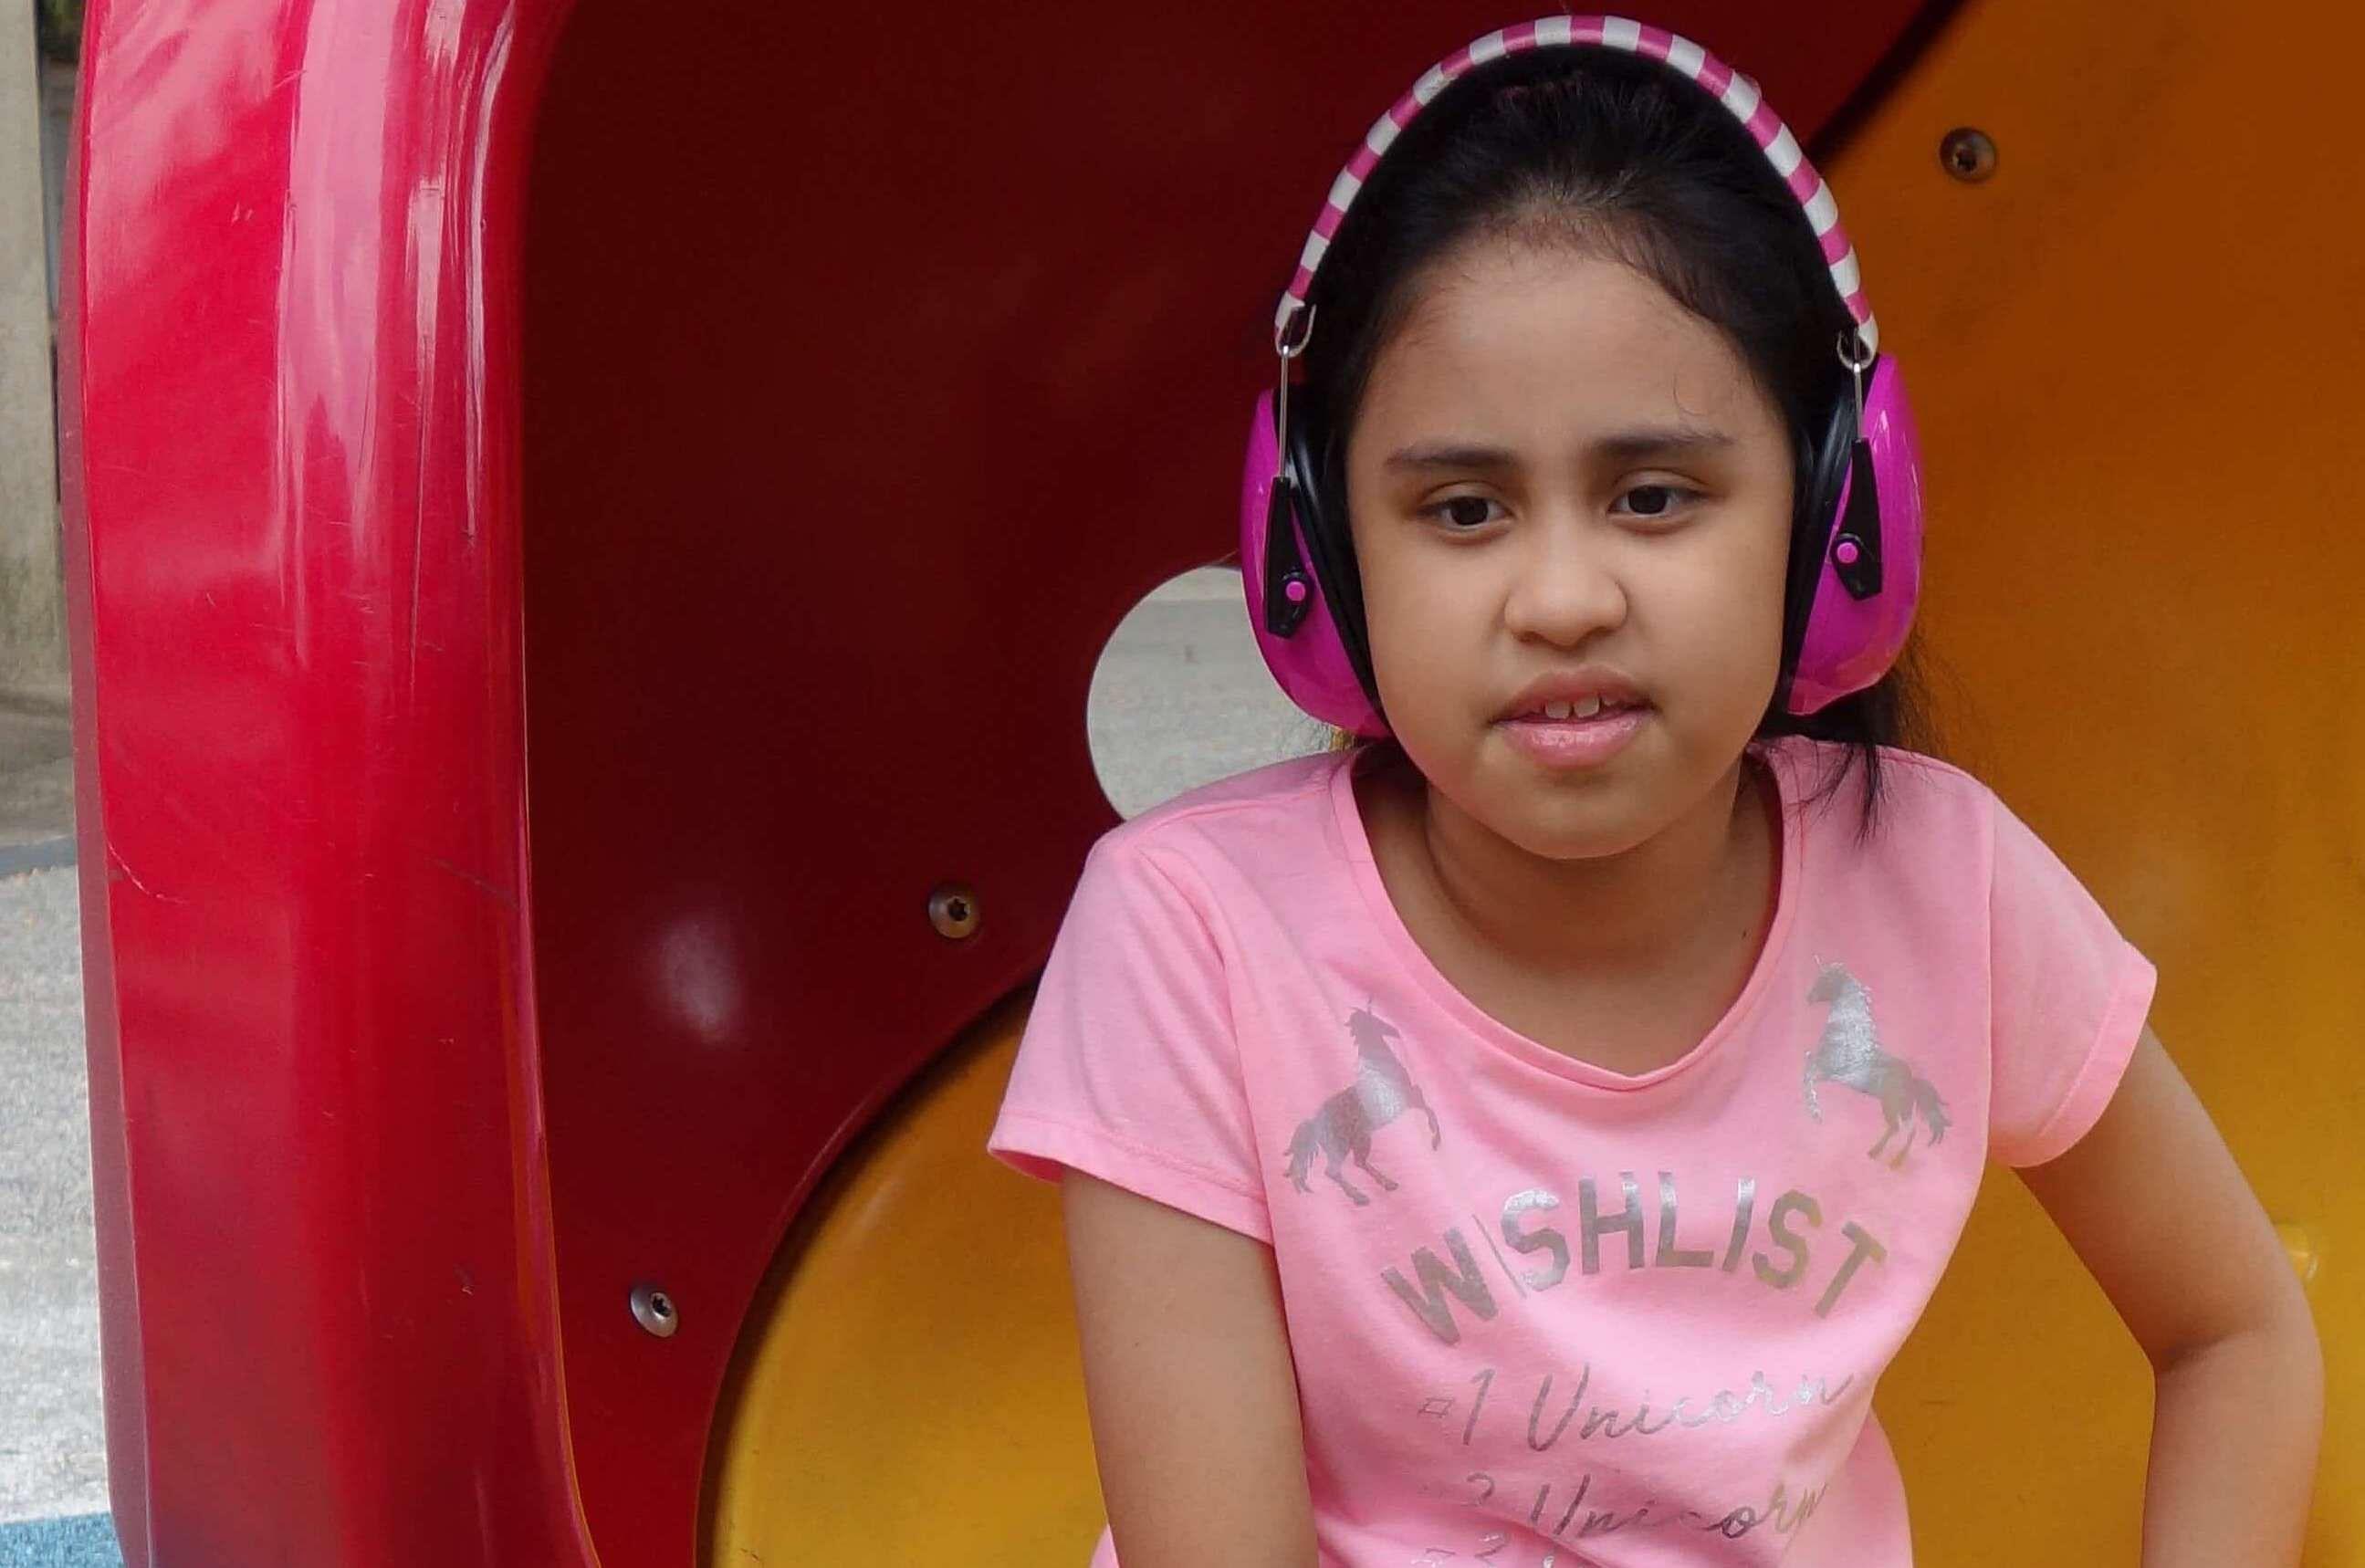 Natasha wearing headphones